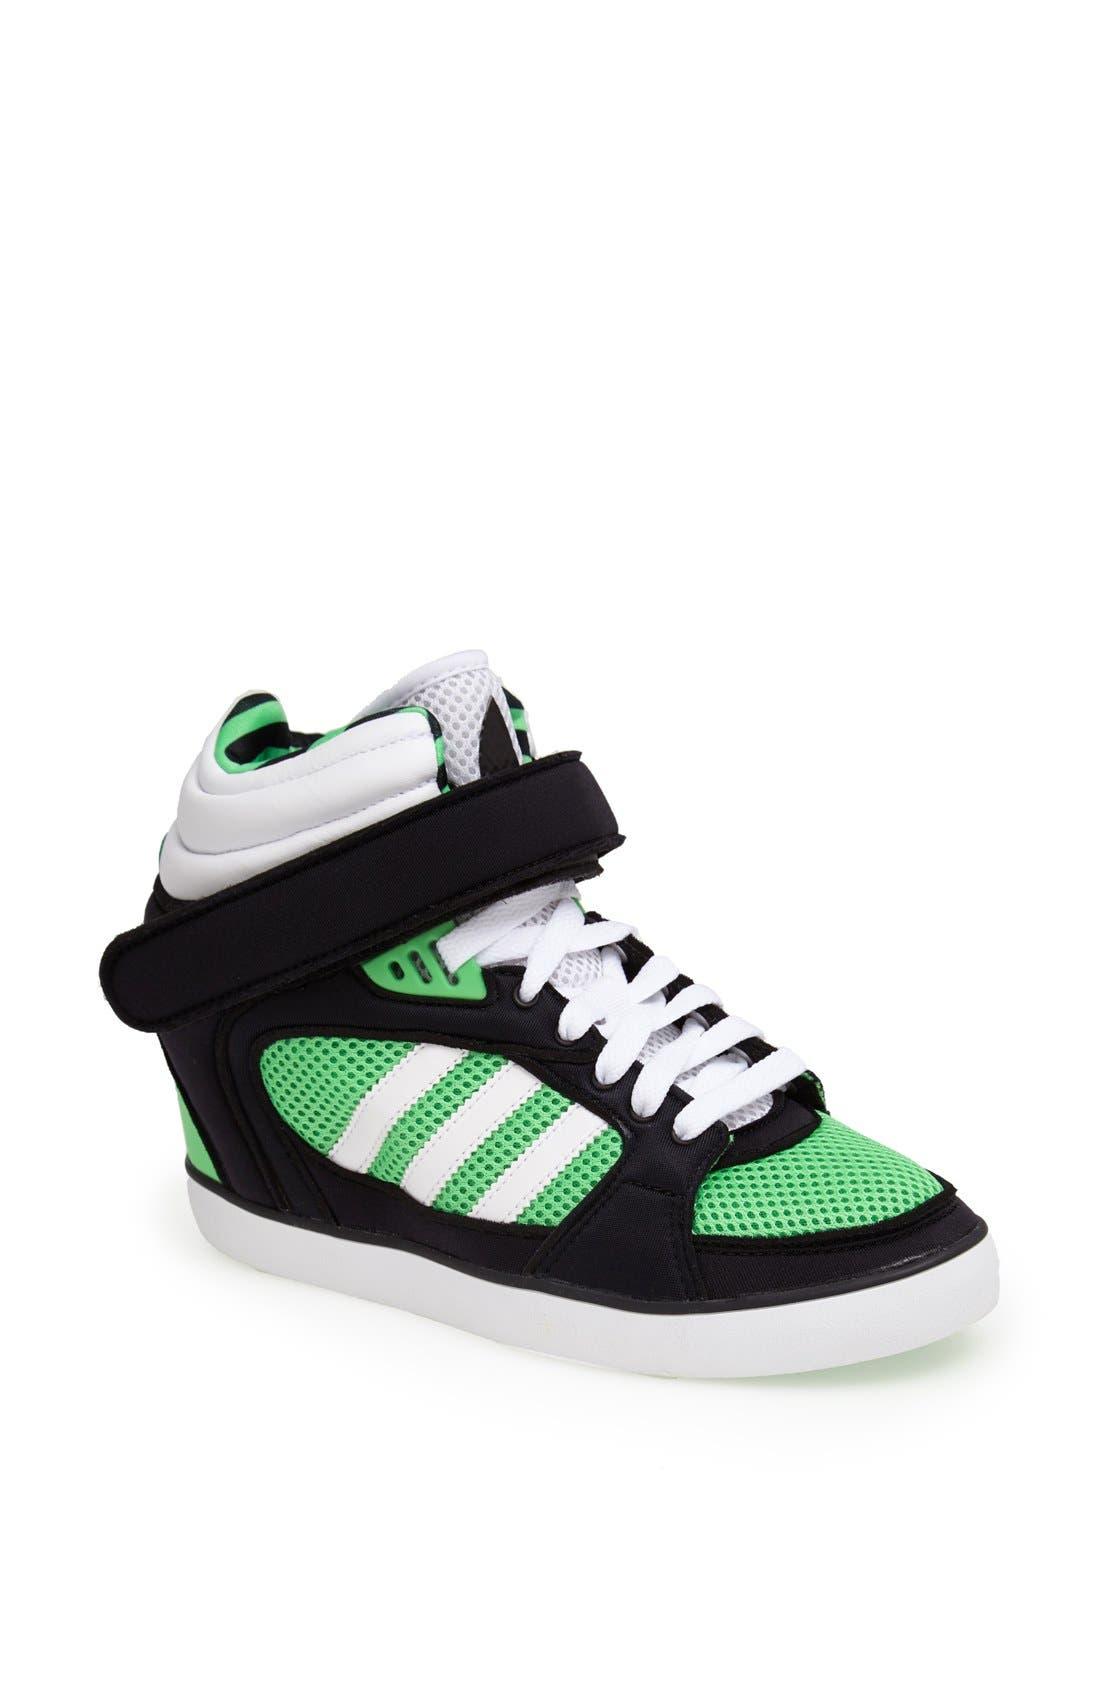 Main Image - adidas 'Amerlight' Wedge Sneaker (Women)